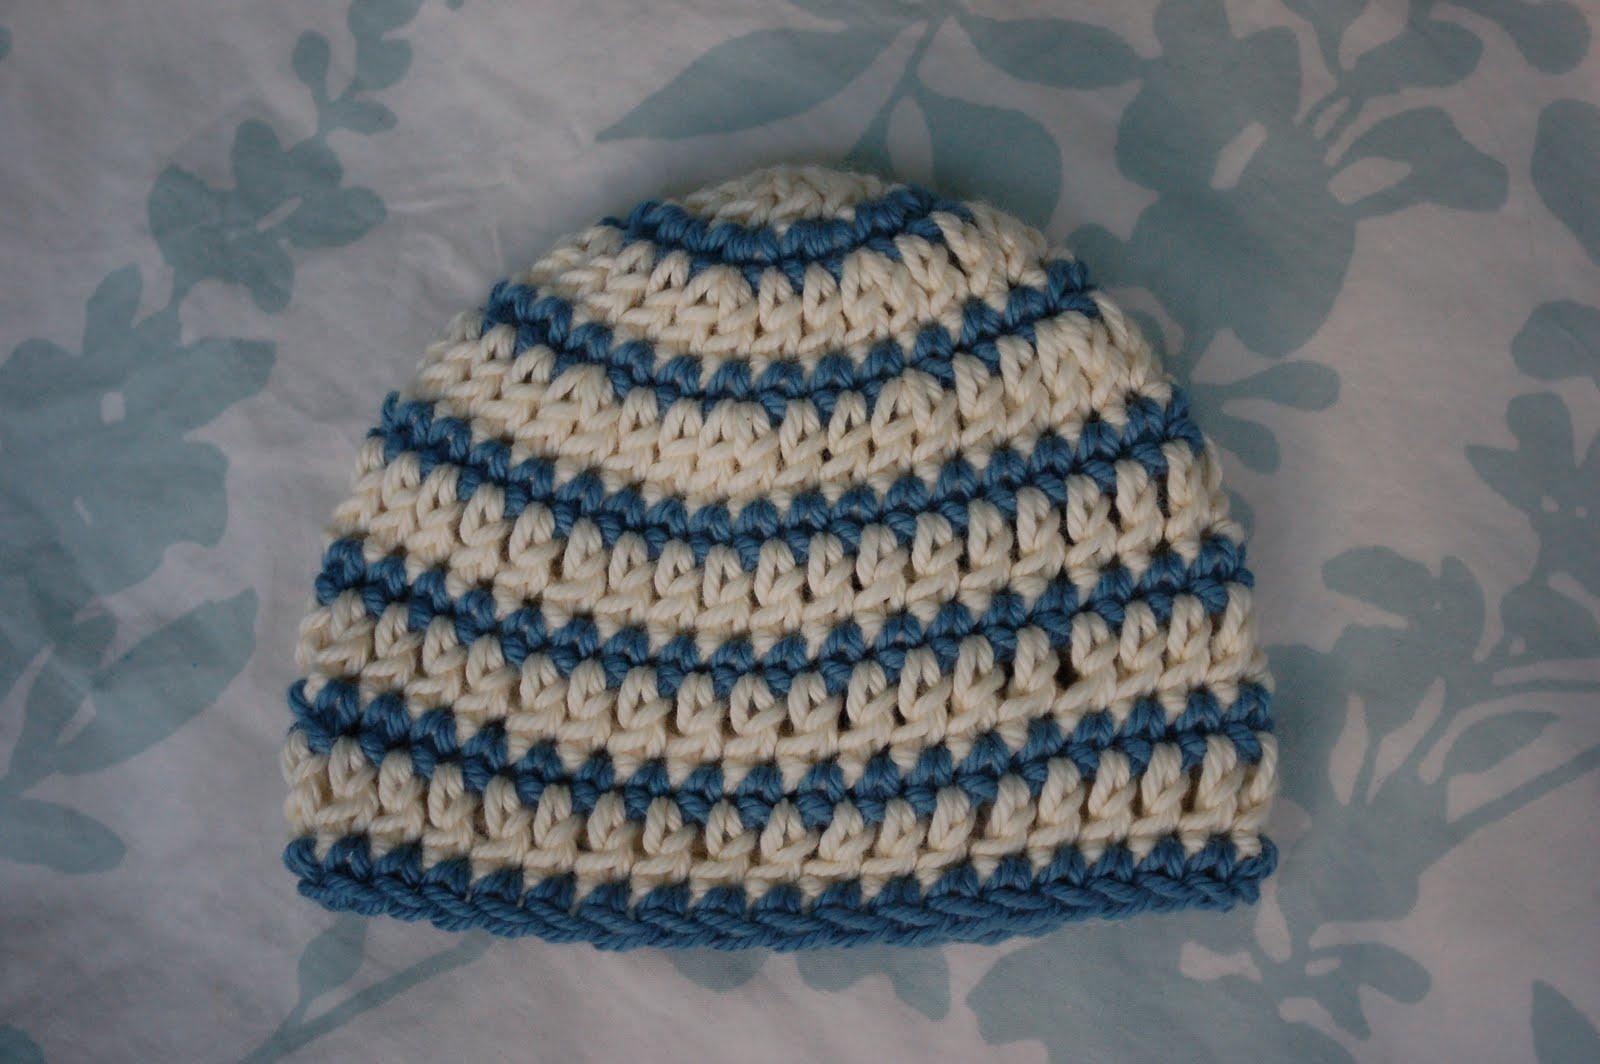 Newborn Single Crochet Hat Pattern : Alli Crafts: Free Pattern: Thick and Thin Striped Beanie ...